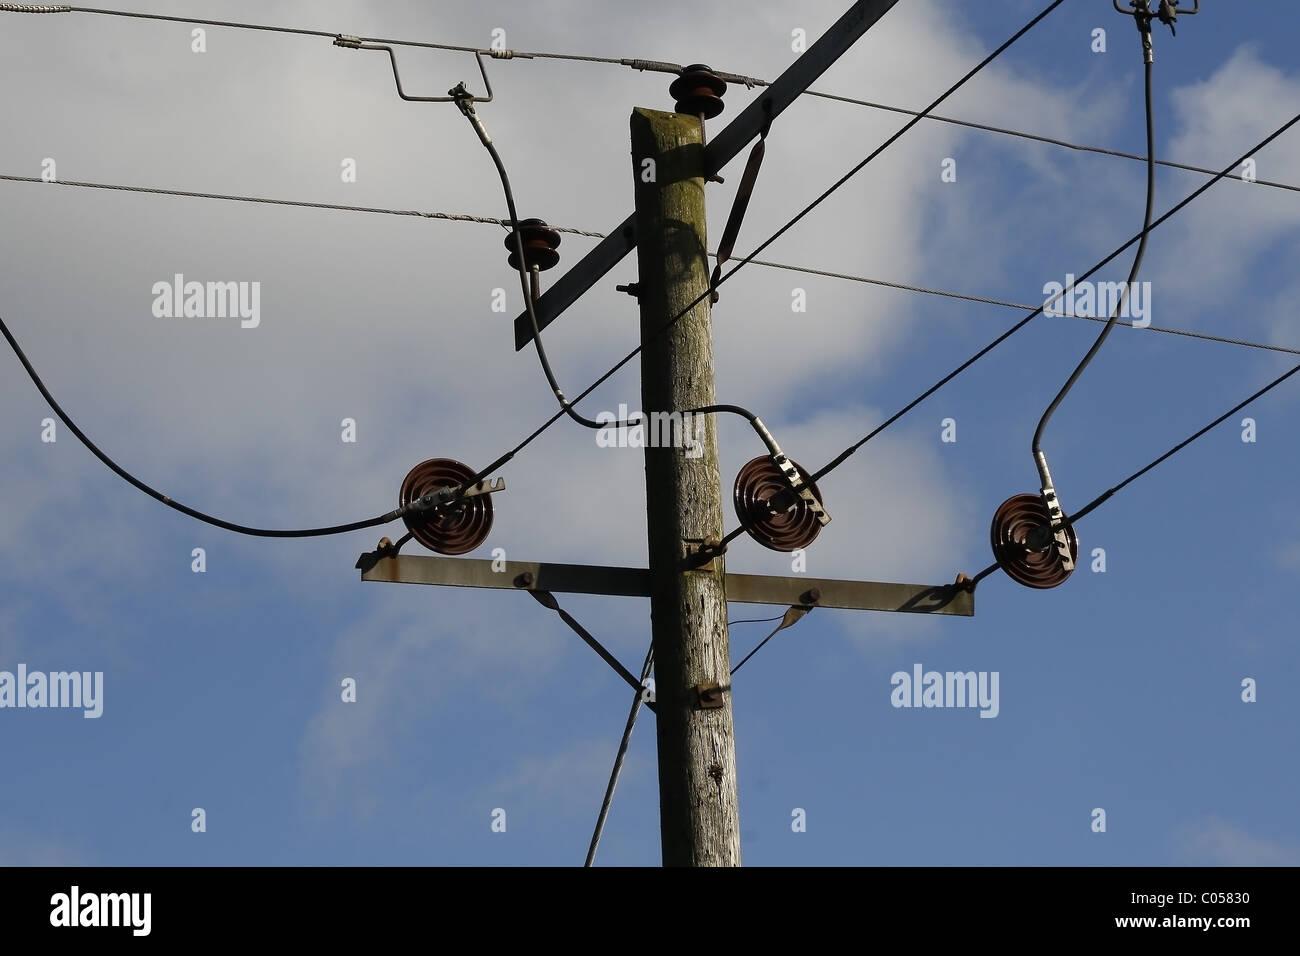 Electric Telegraph Stock Photos & Electric Telegraph Stock Images ...